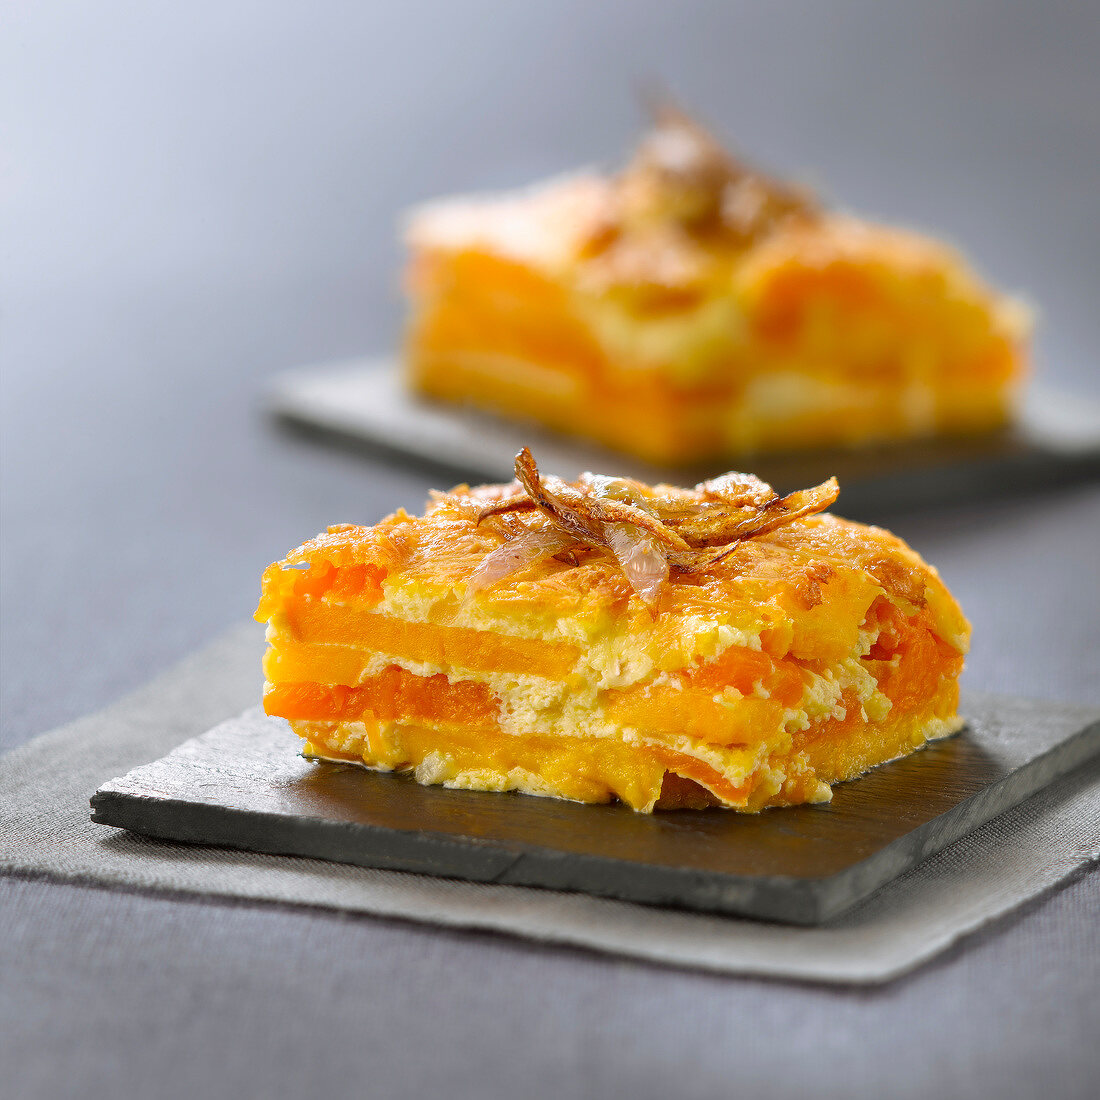 Pumpkin and sweet potato bake